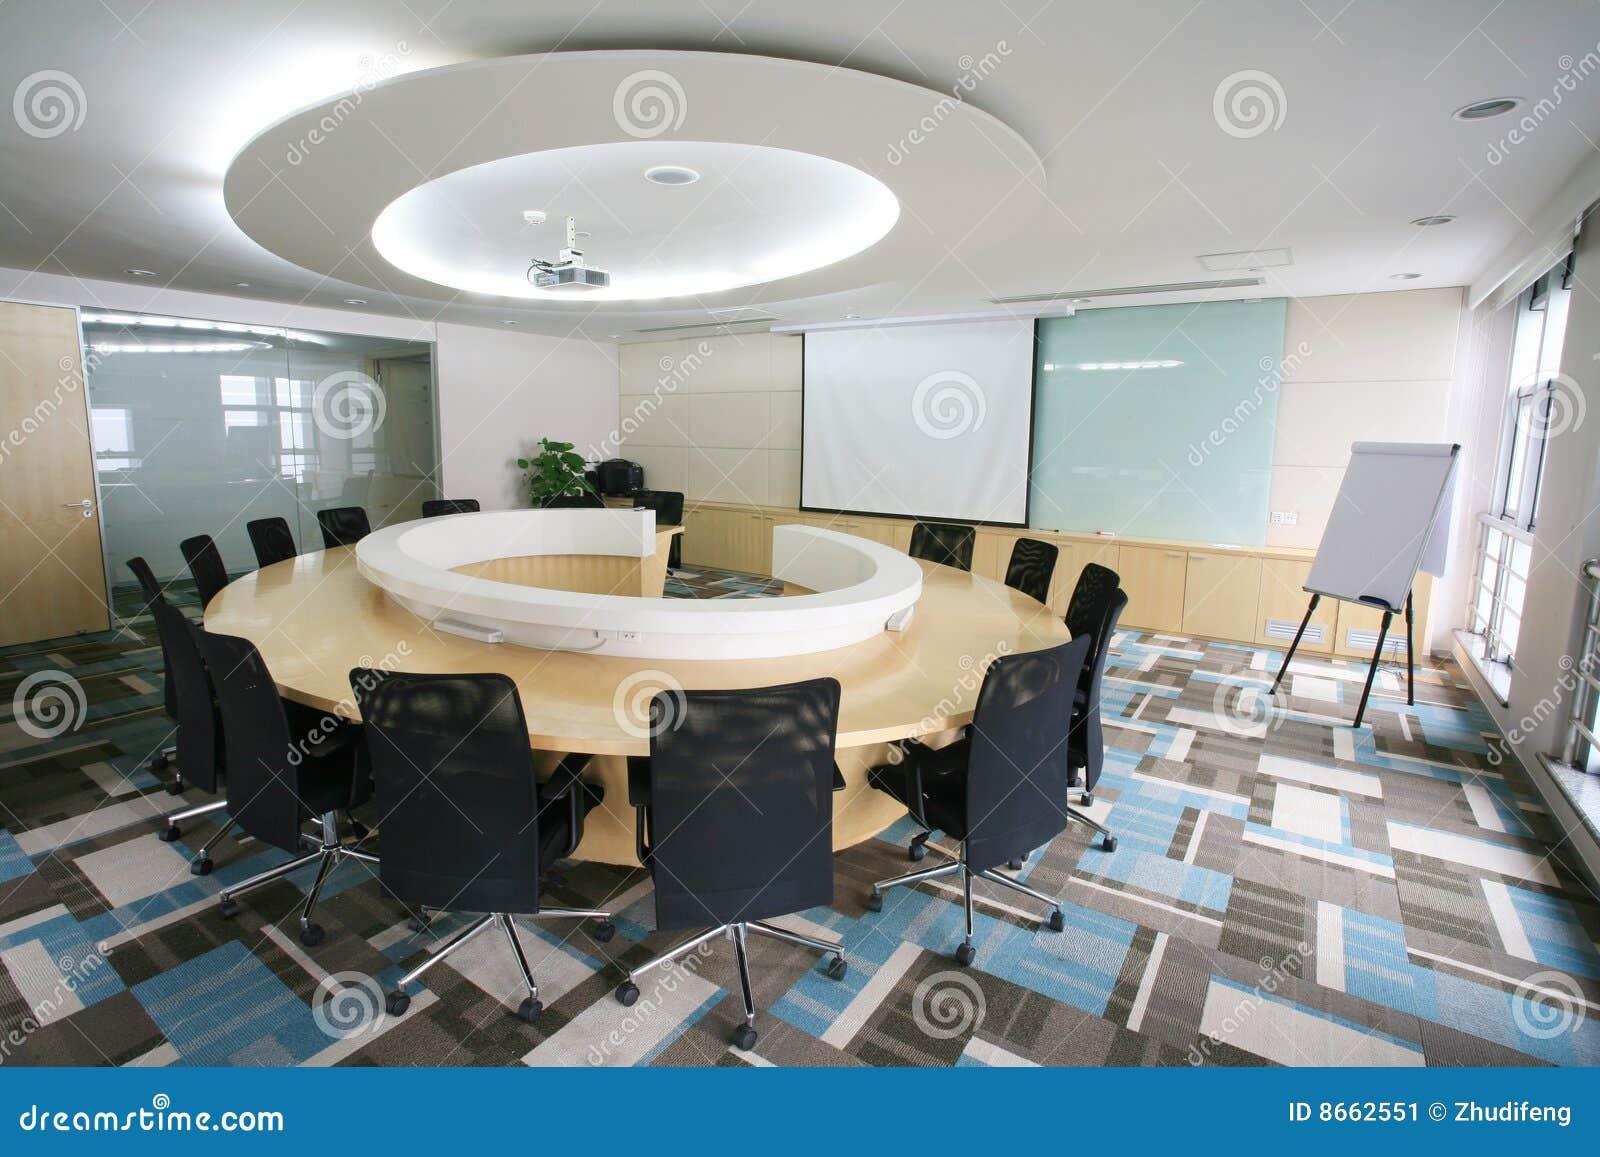 Modern Meeting Room Interior Stock Image Image 8662551